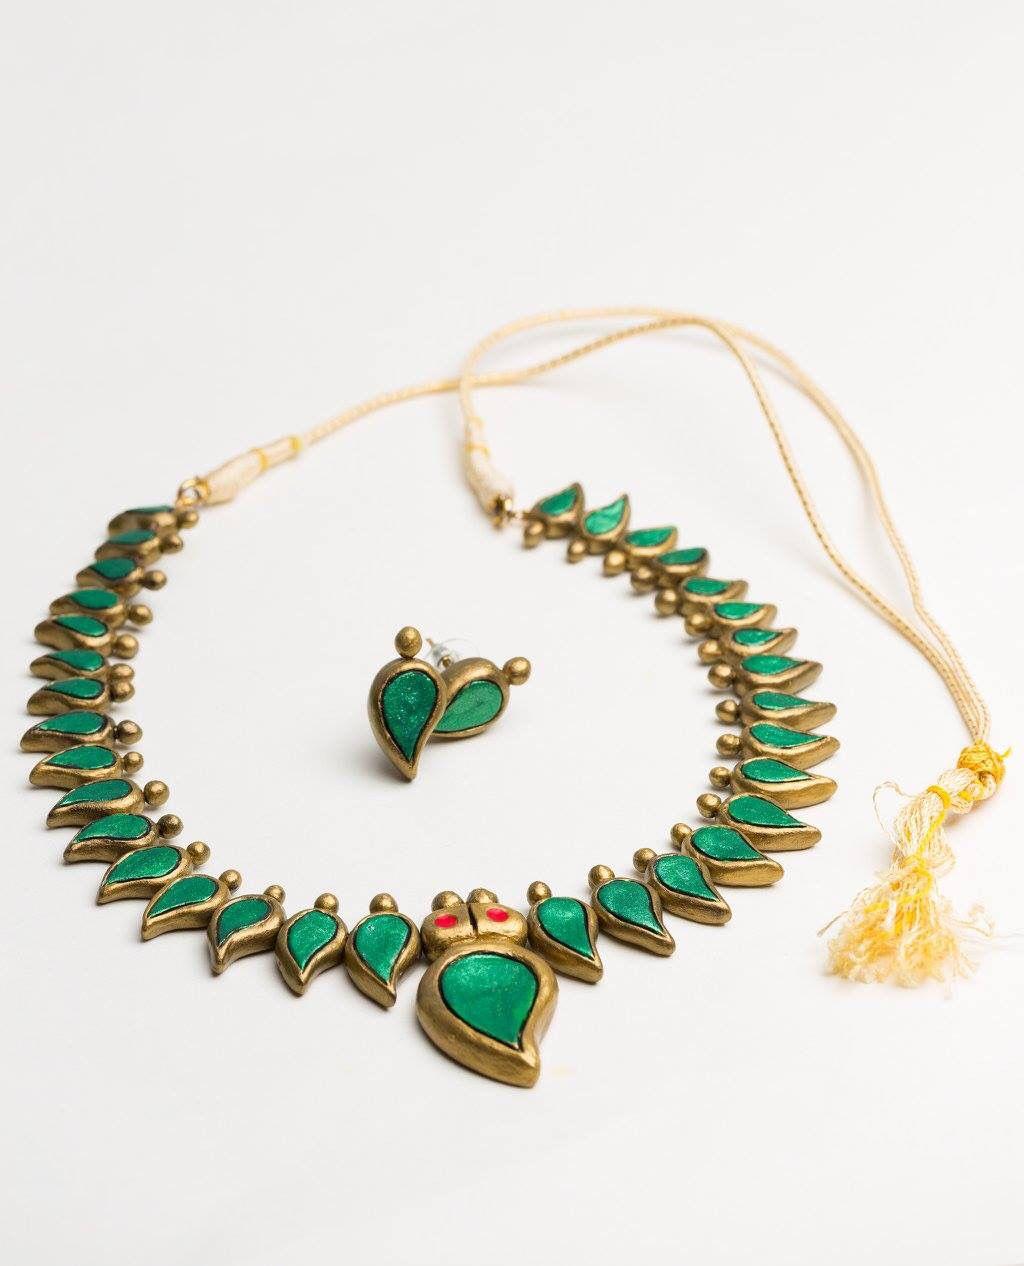 Pin by Vibhushitha Chandrasekaran on Terra cotta jewelry Pinterest